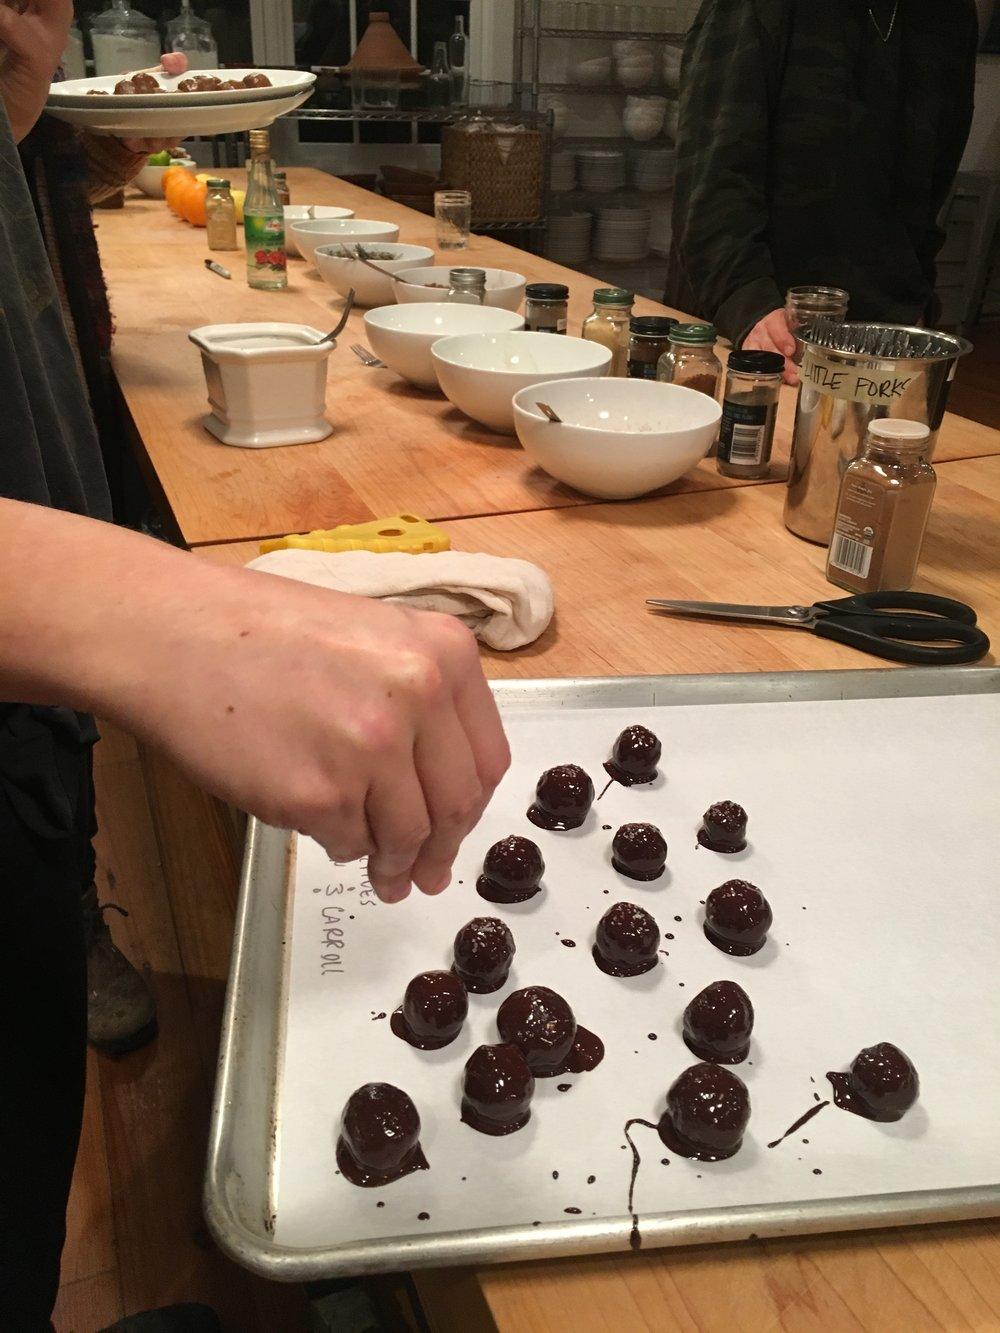 Making herbal aphrodisiac truffles… yummm